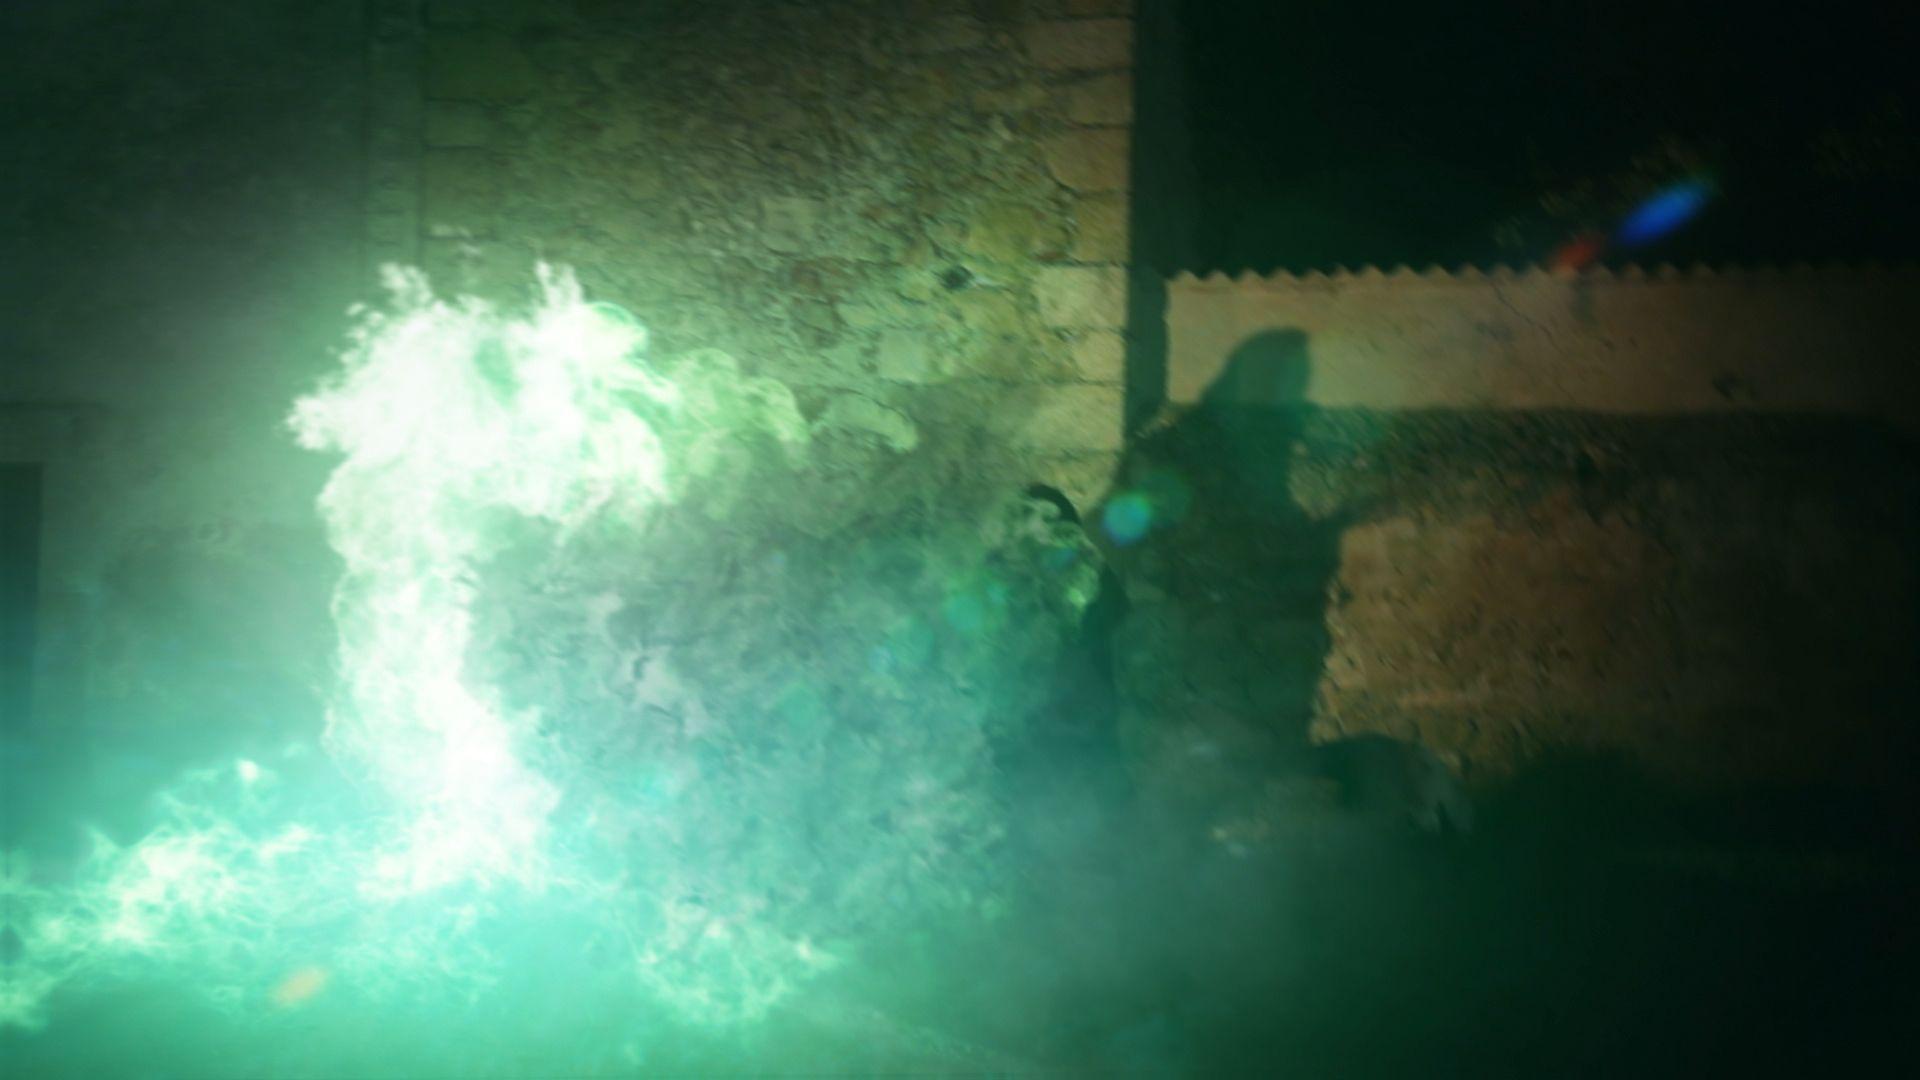 VFX explosion shot